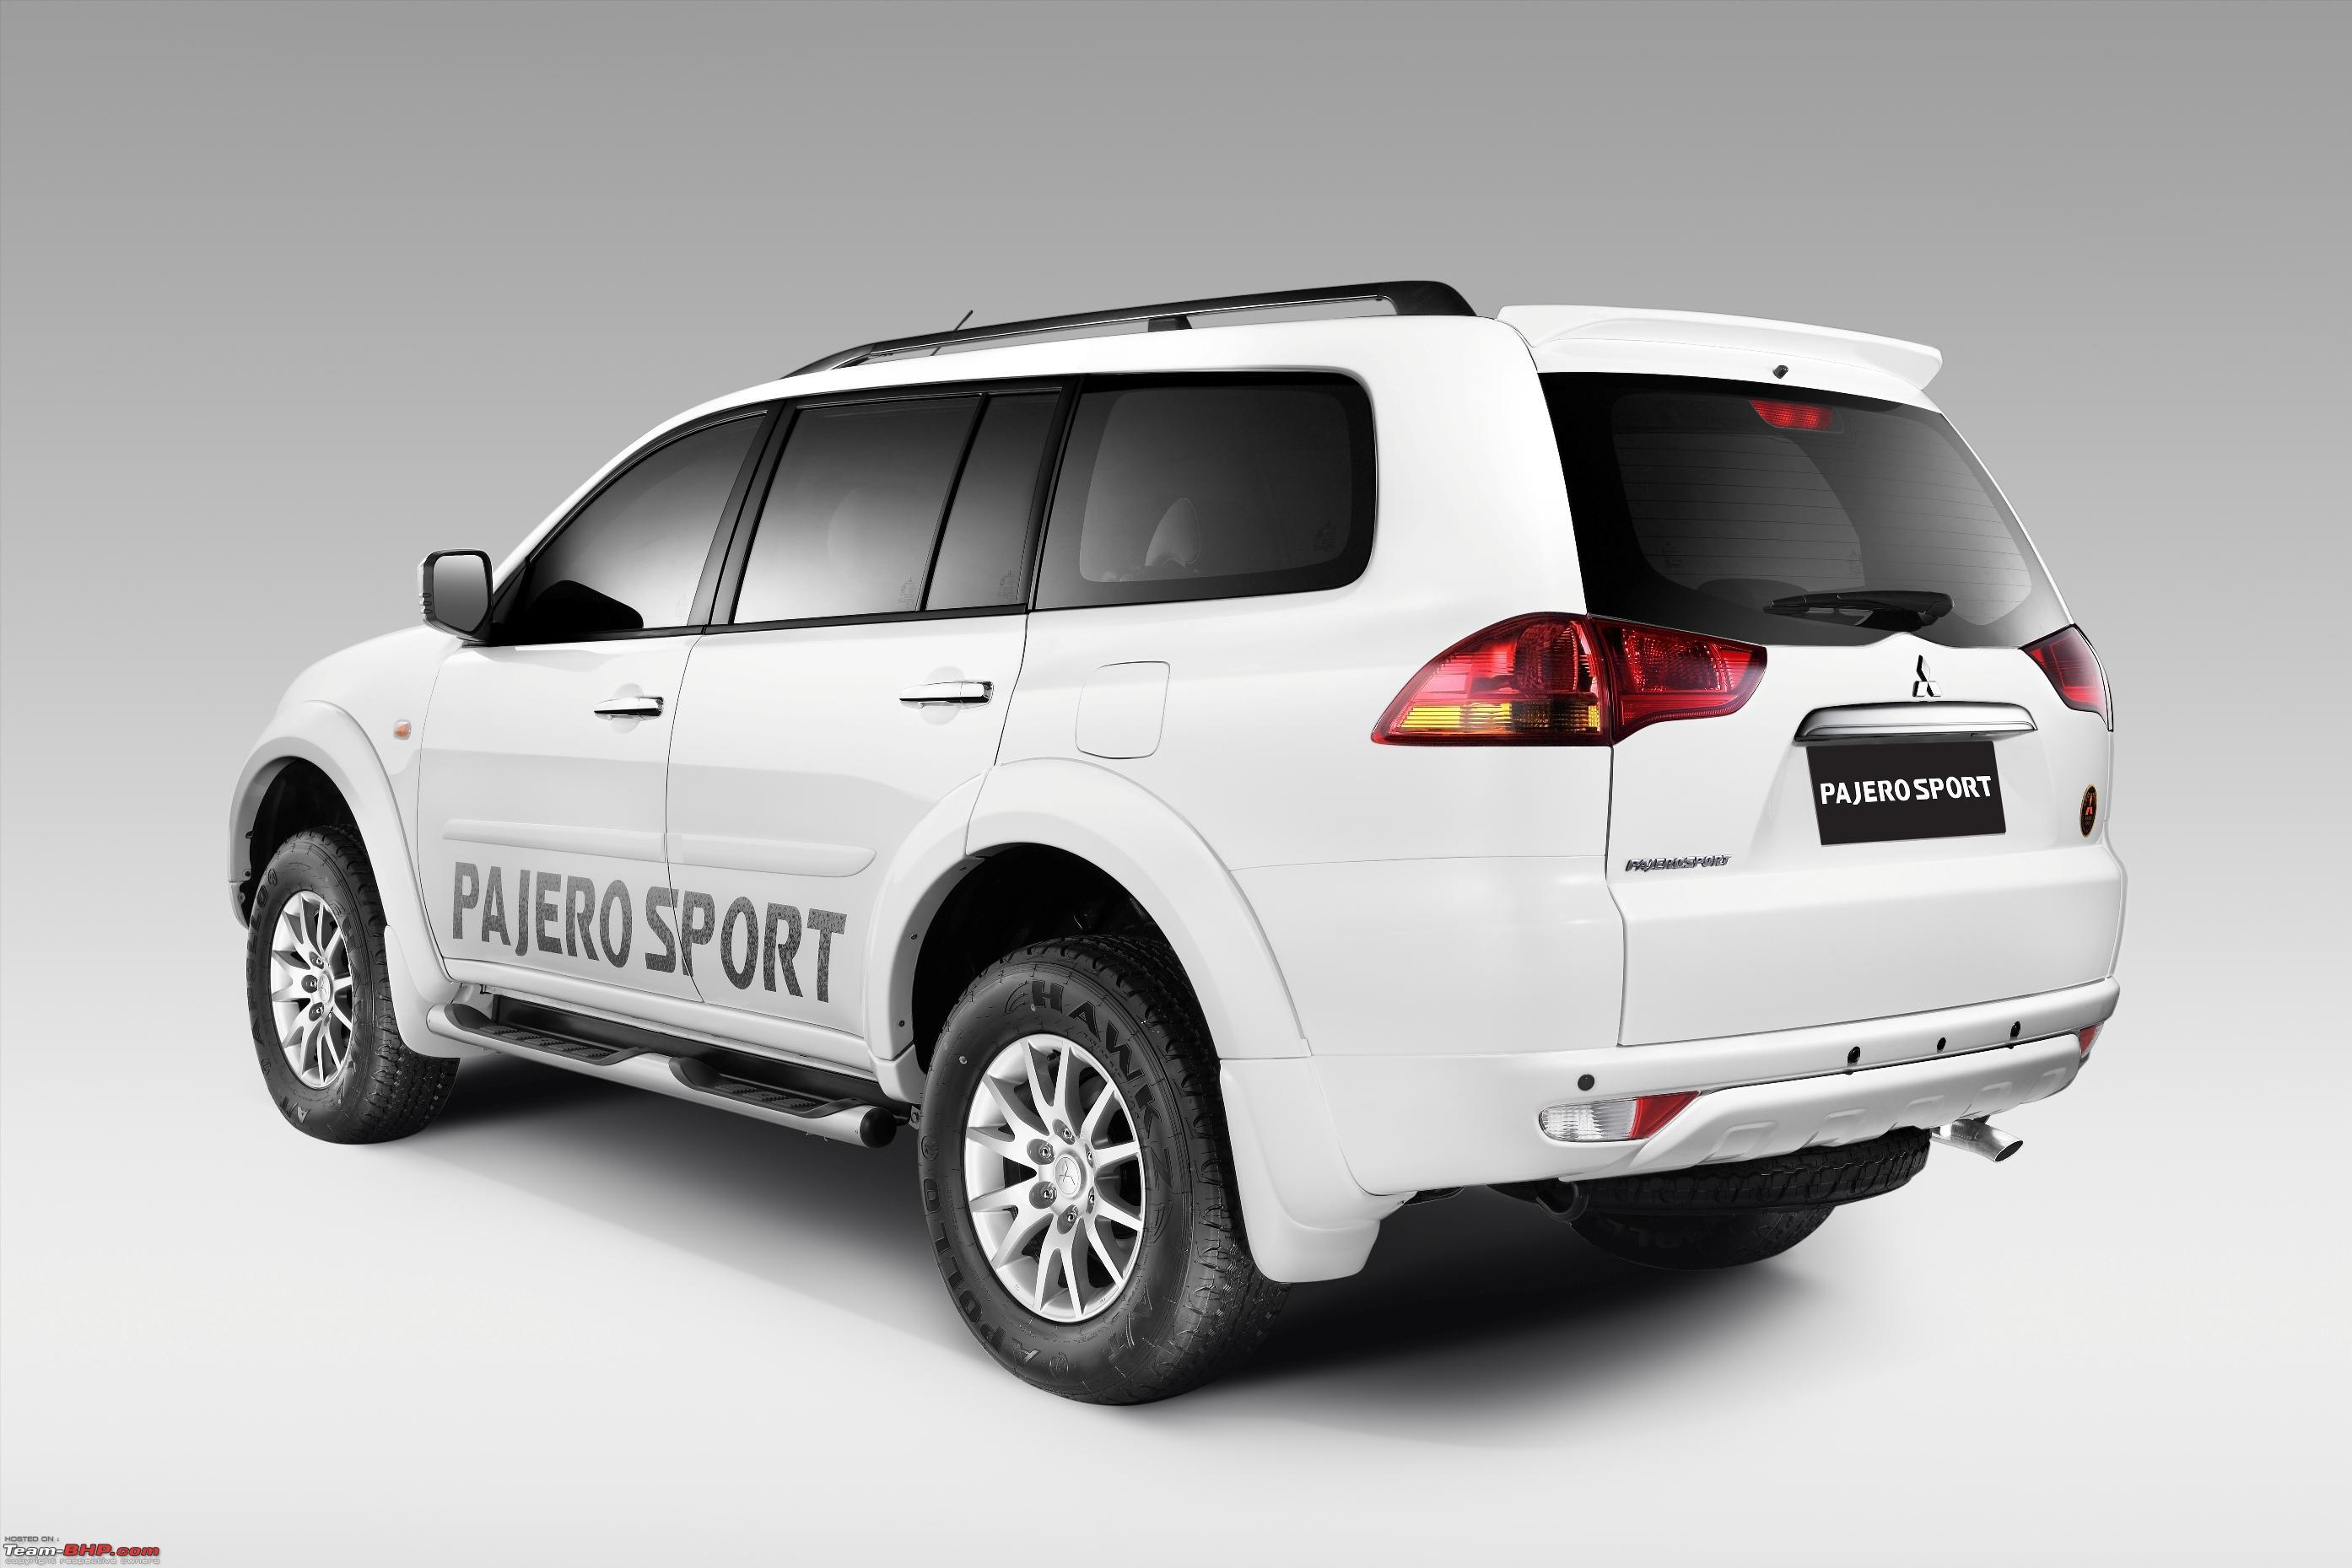 Mitsubishi pajero sport anniversary edition suv 2013 mitsubishi pajero sport